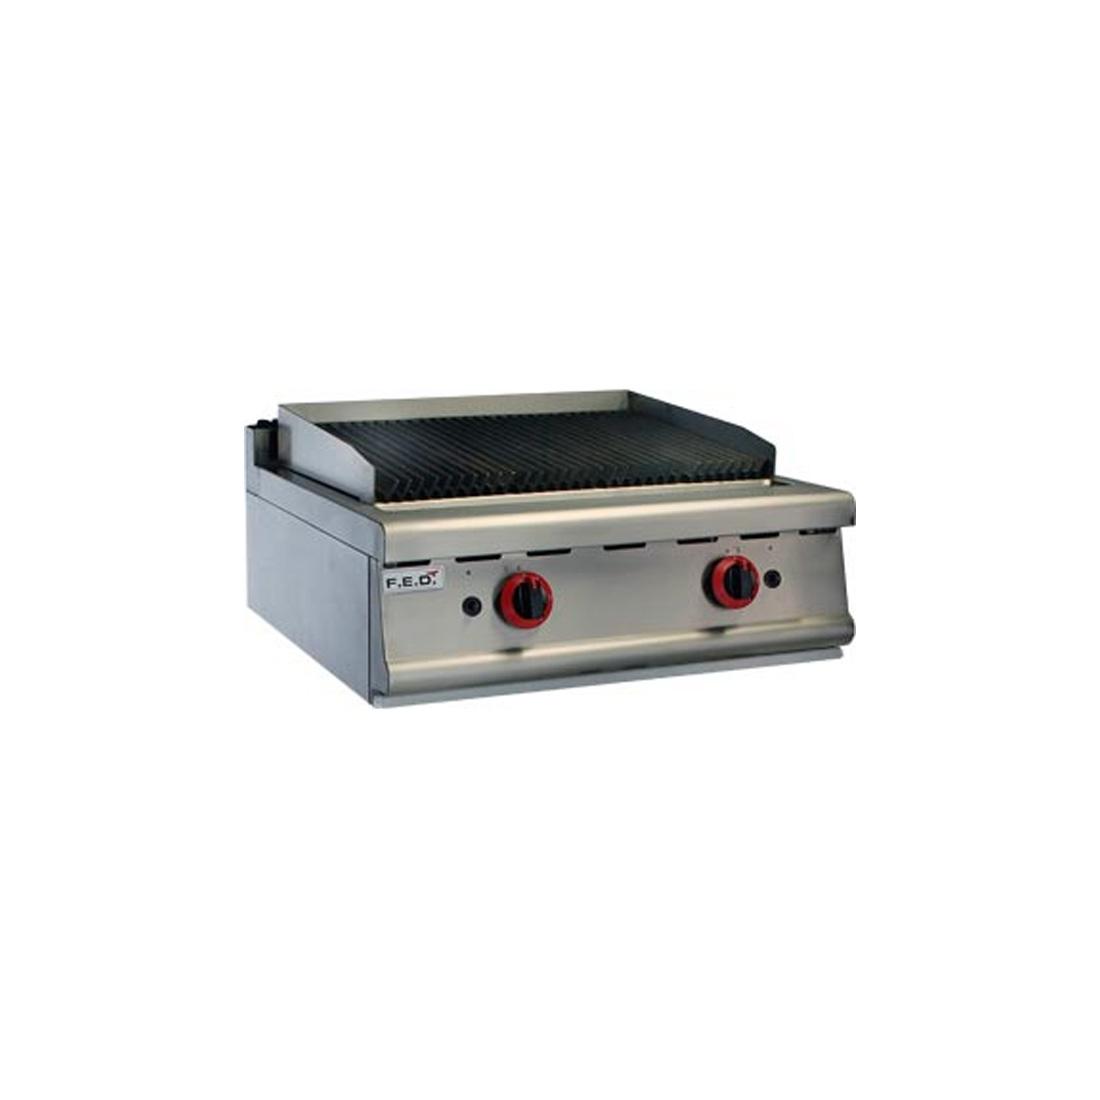 JZH-TRHLPG LPG Gas Char Grill Top